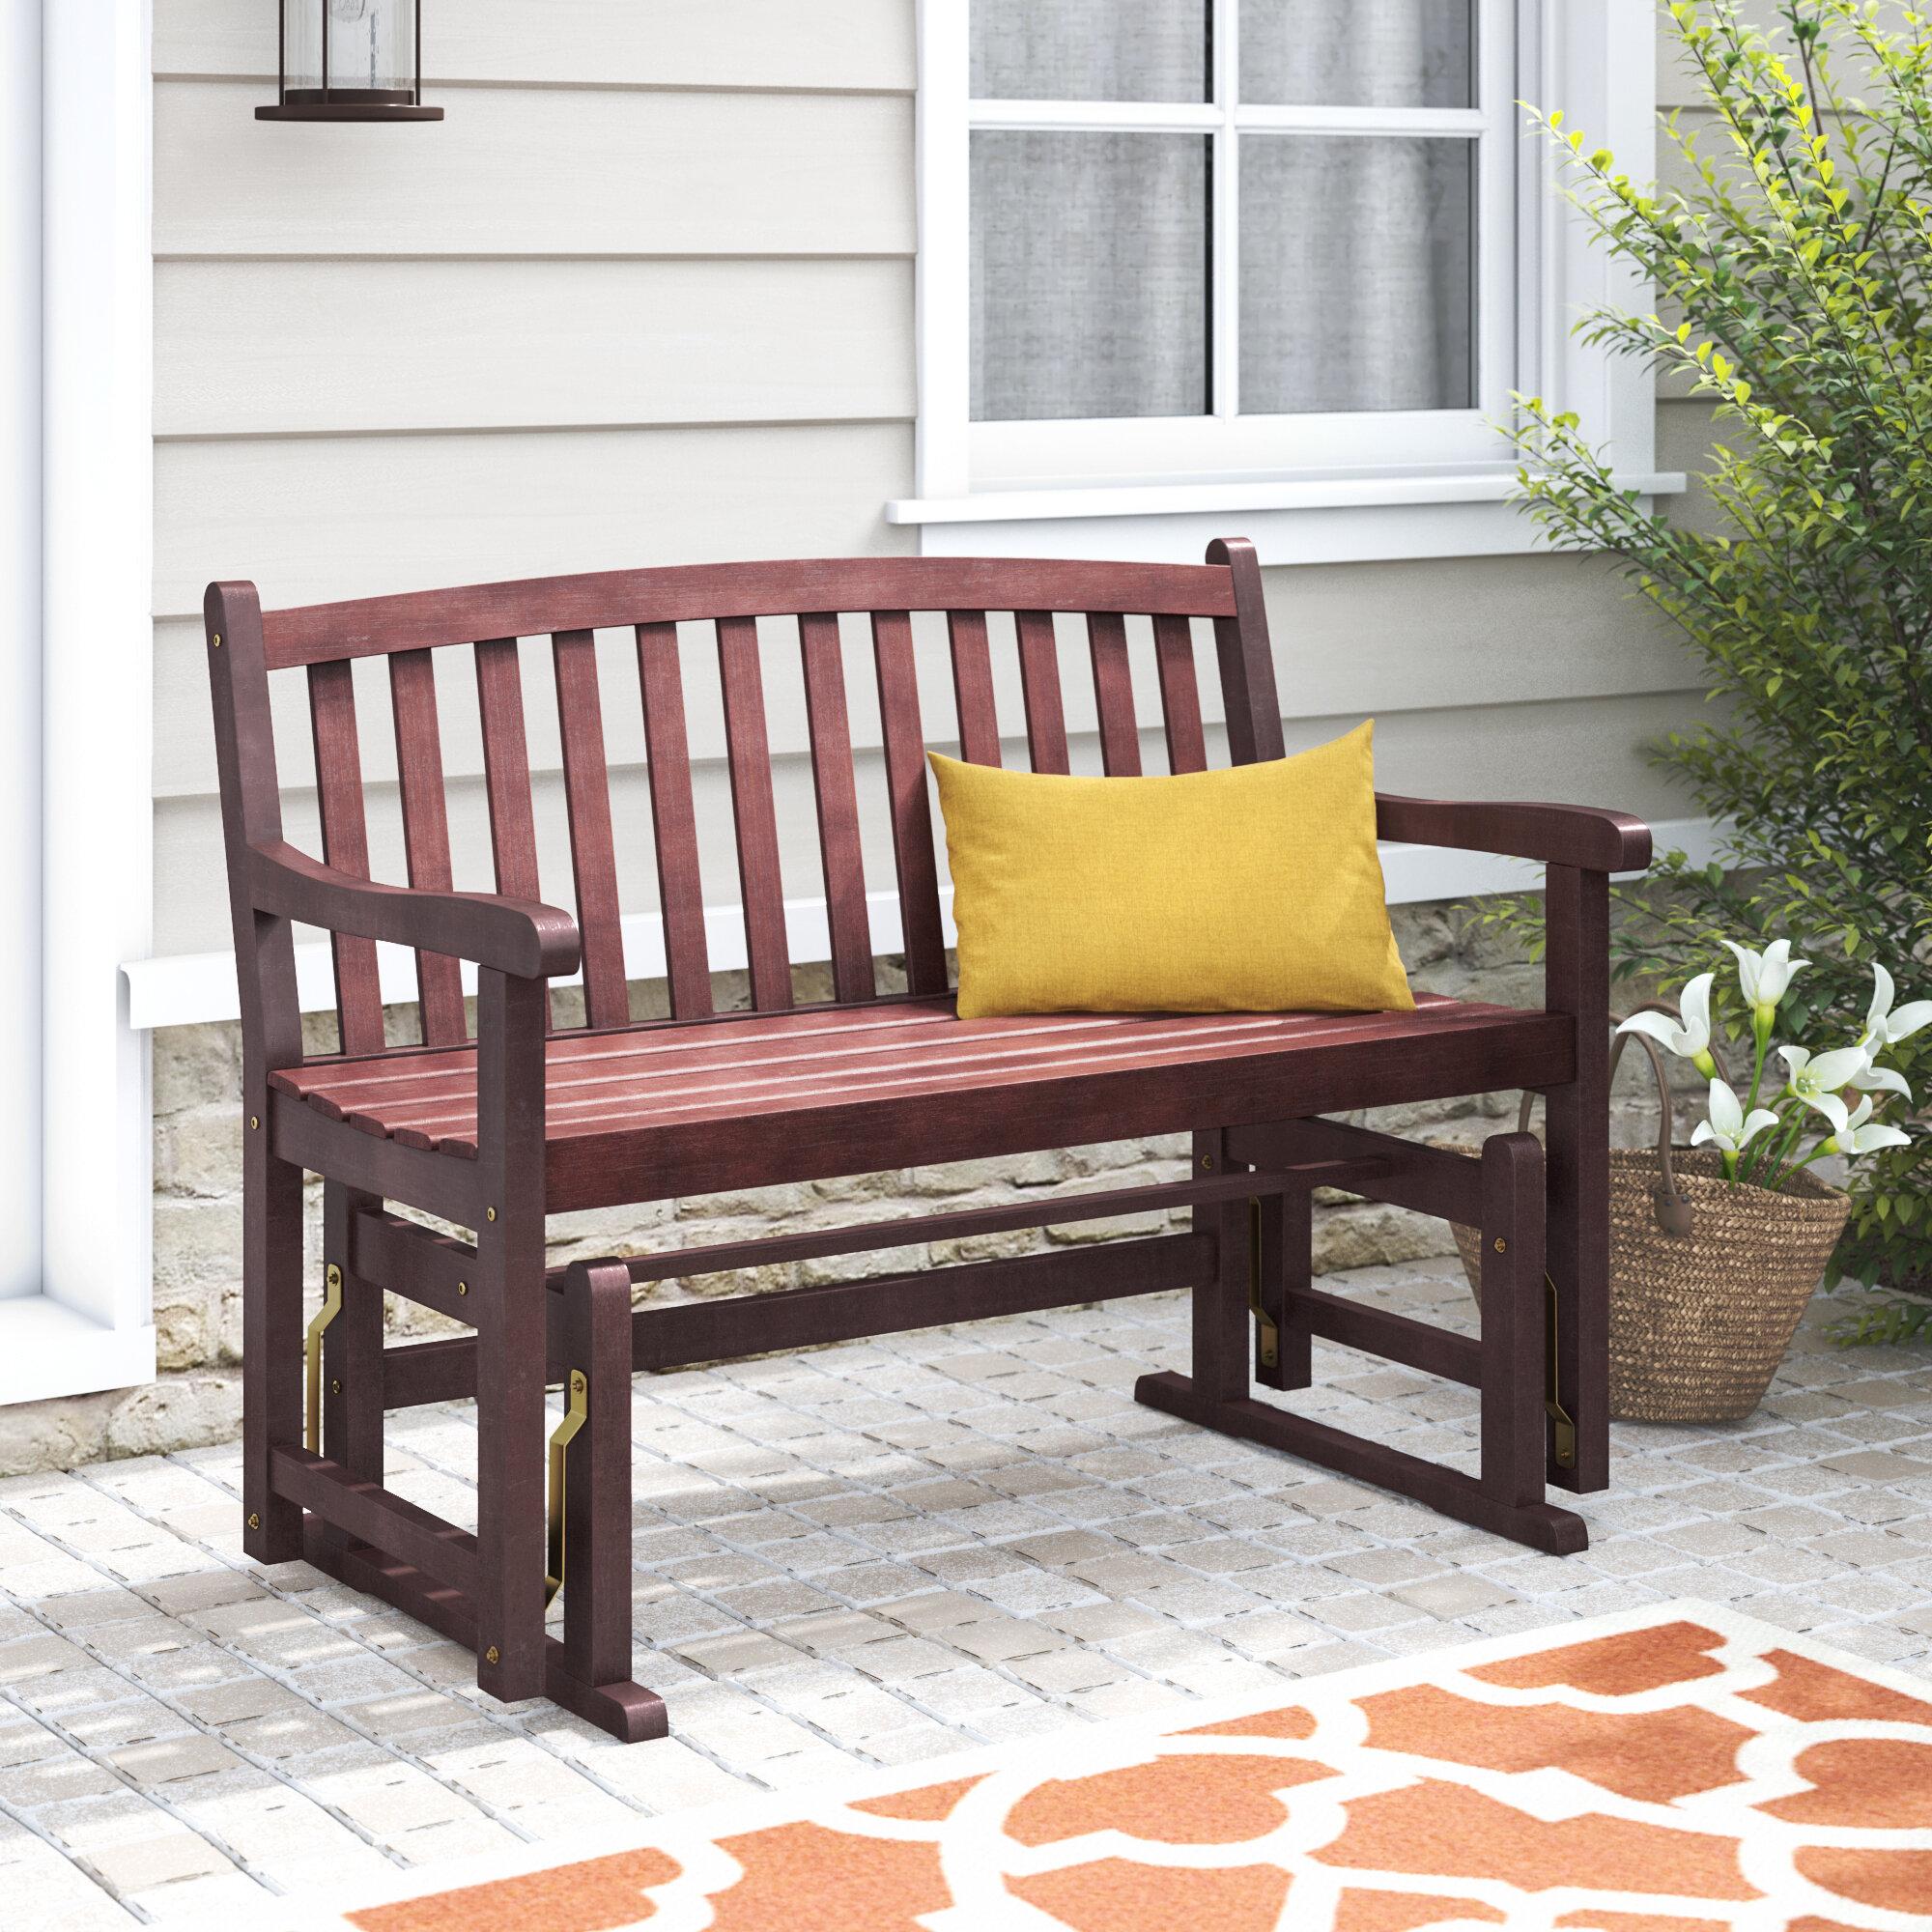 Picture of: Charlton Home Worcester Glider Wood Garden Bench Reviews Wayfair